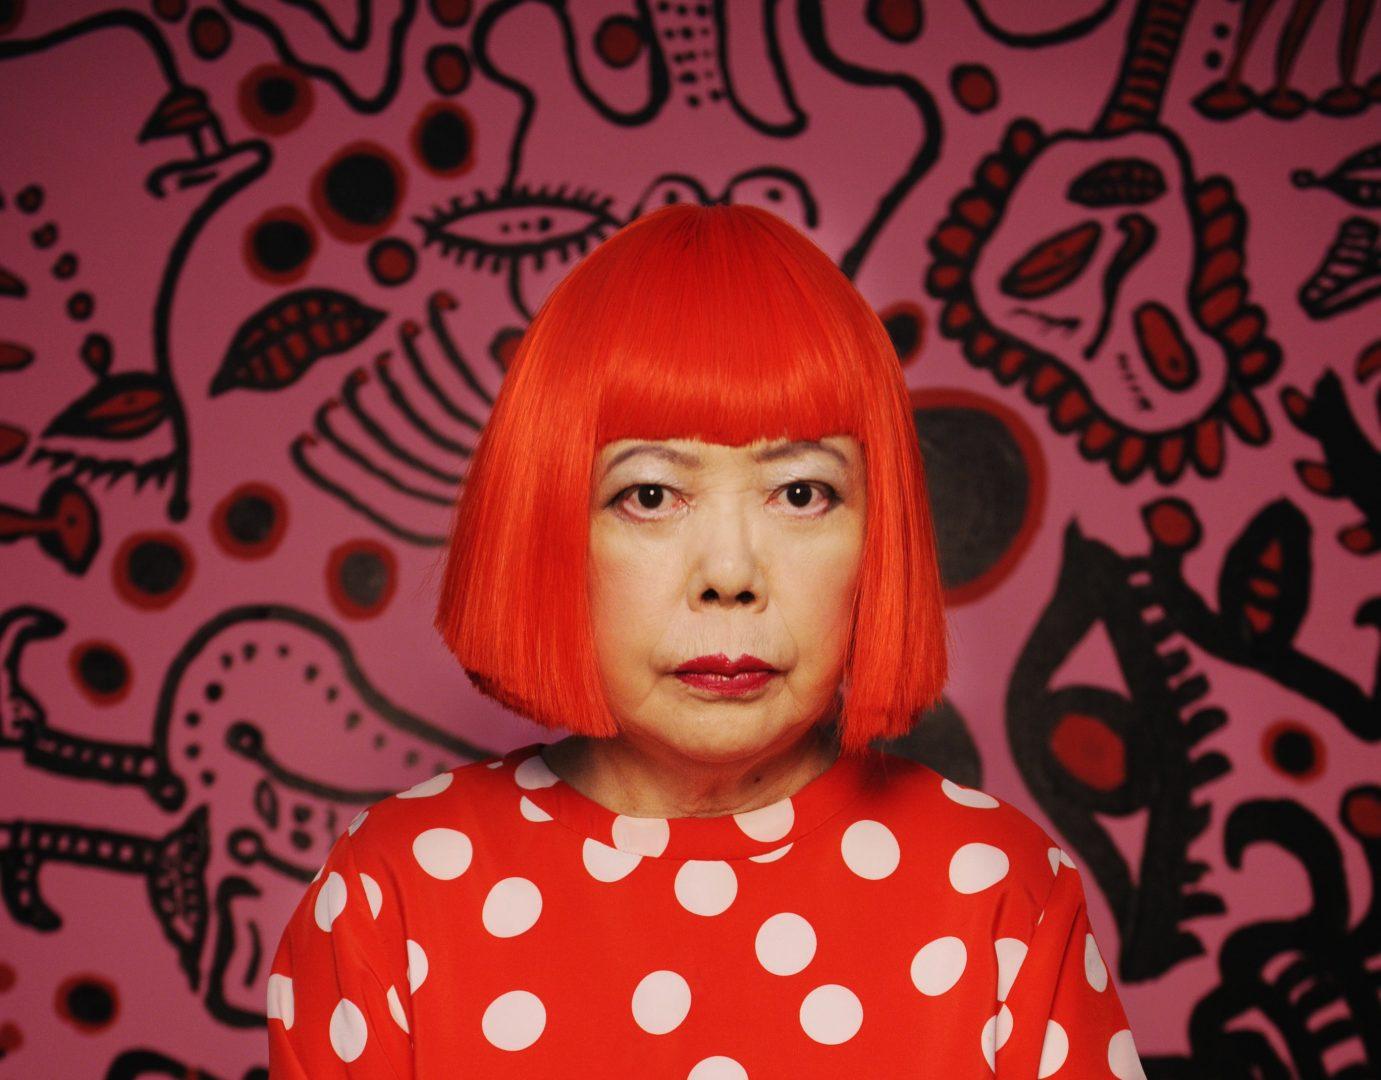 Yayoi Kusama - Artista giapponese contemporanea